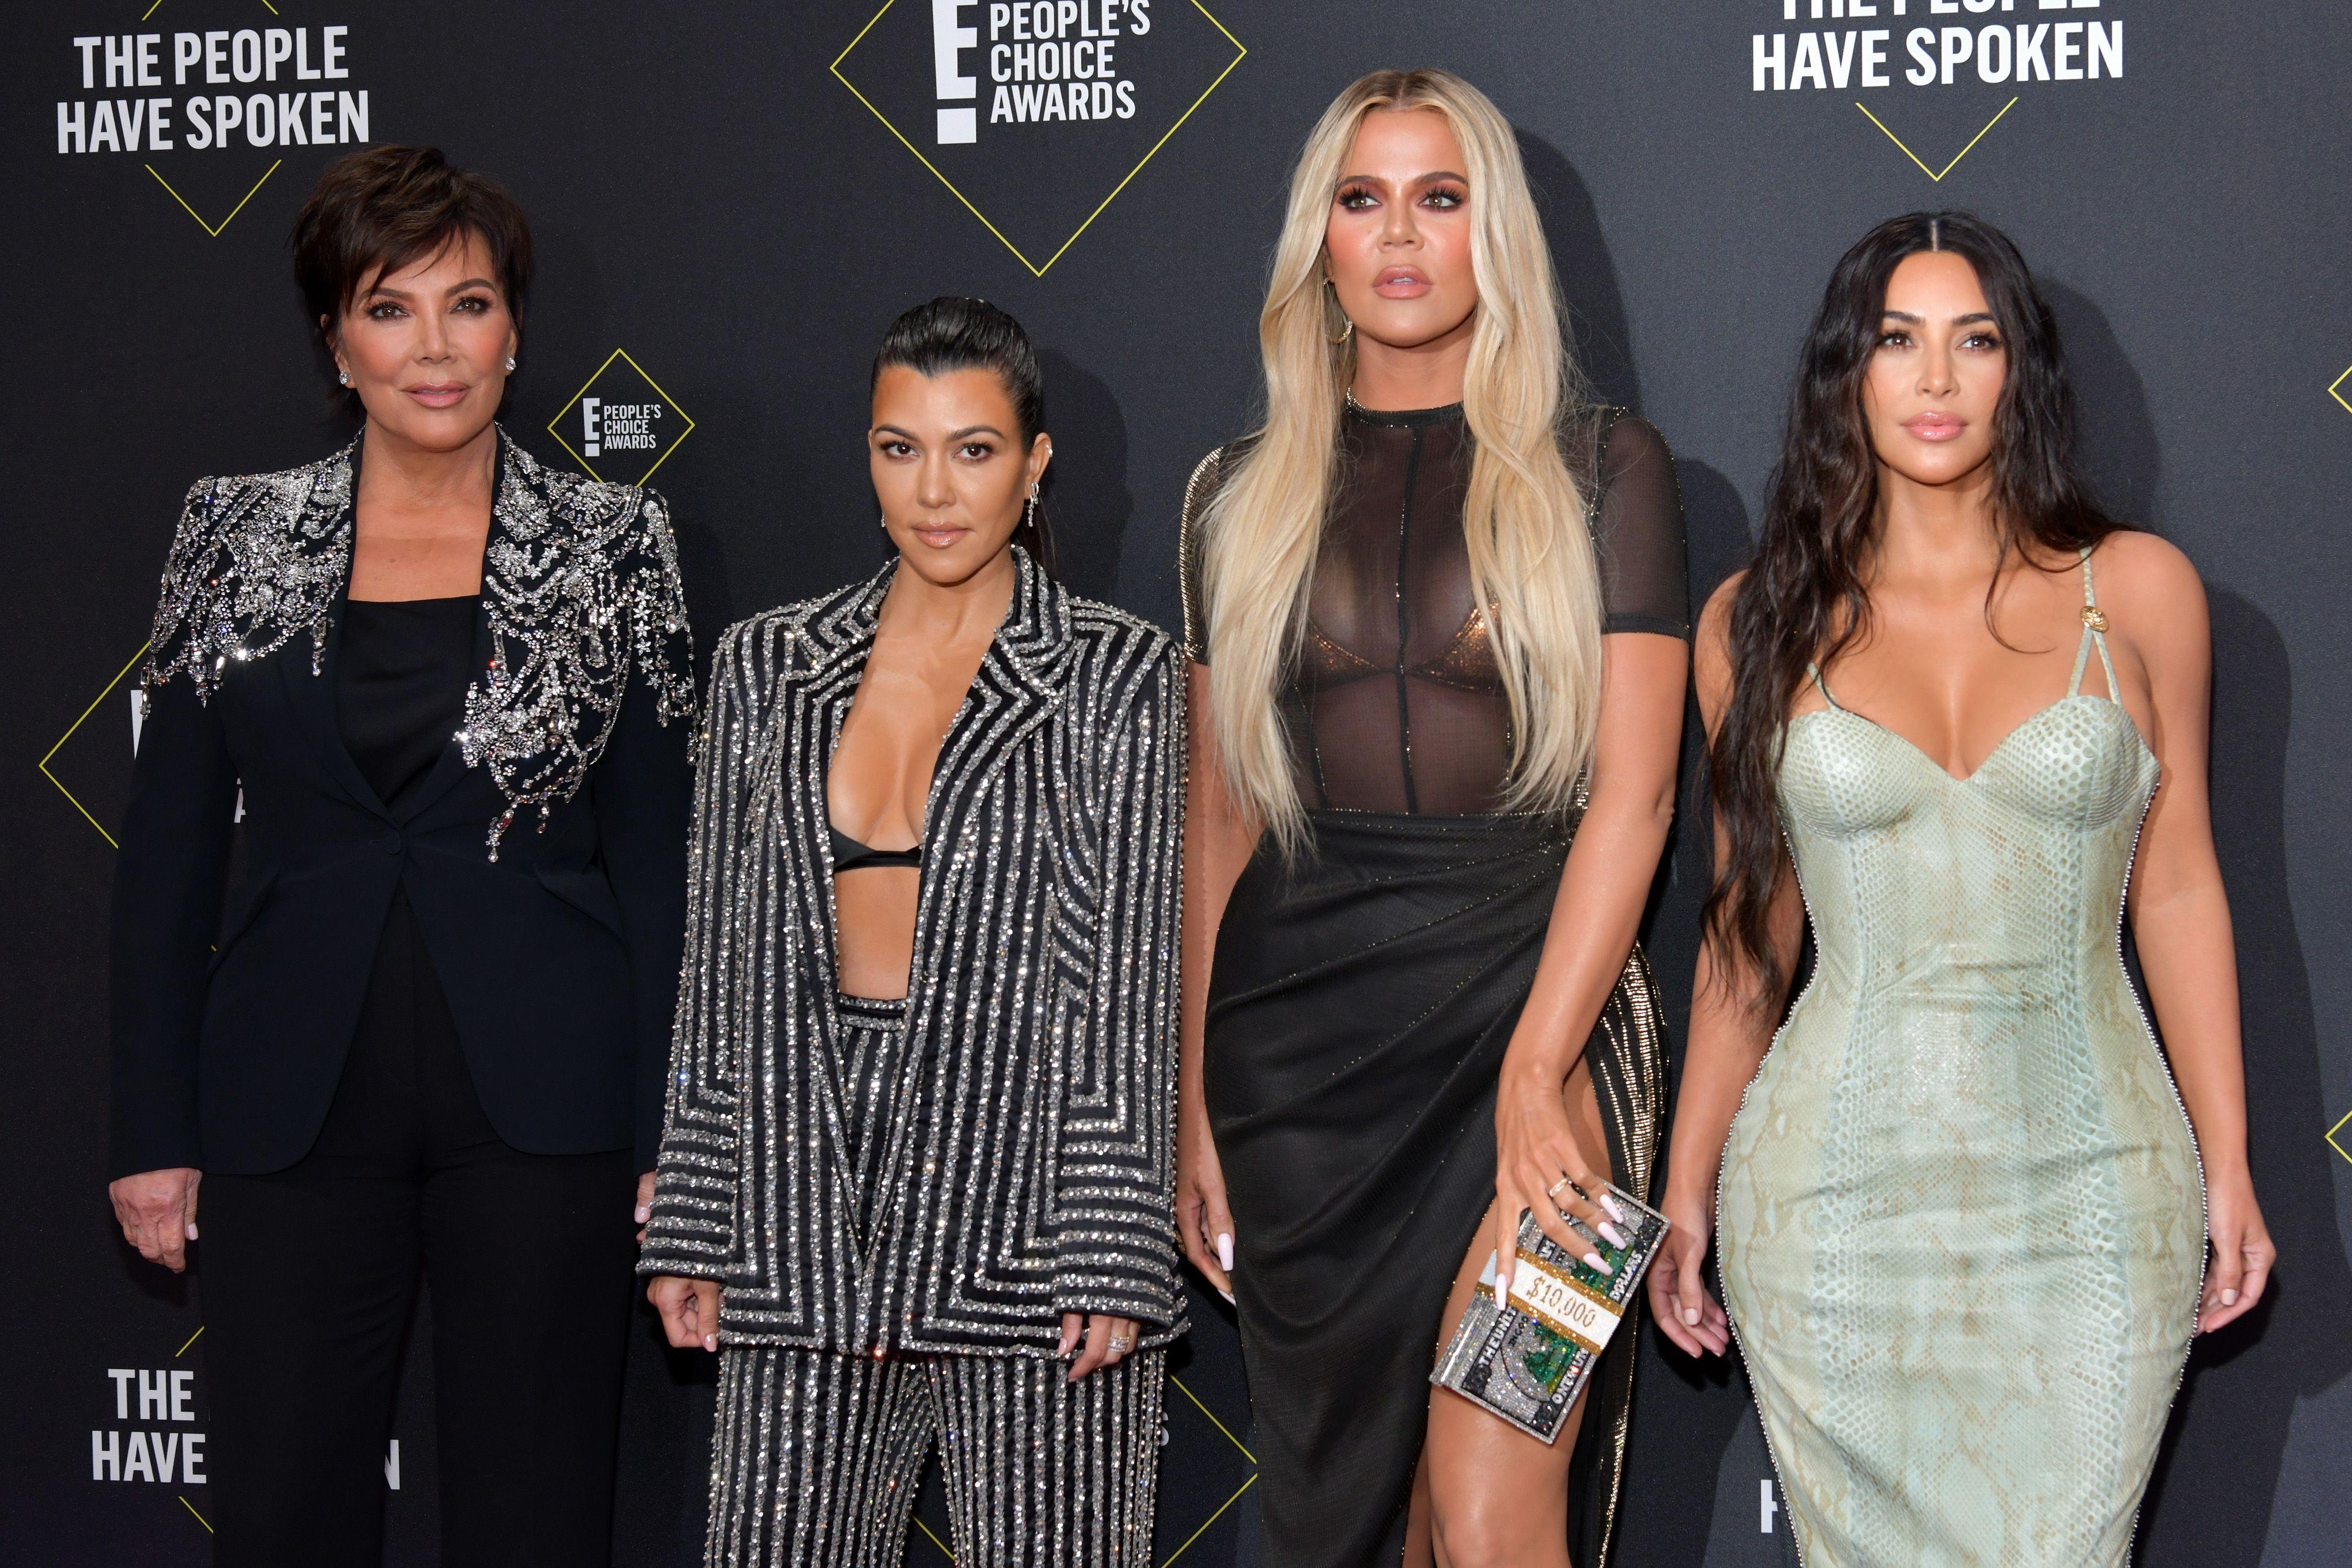 Kris Jenner, Kourtney Kardashian, Khloe Kardashian, and Kim Kardashian